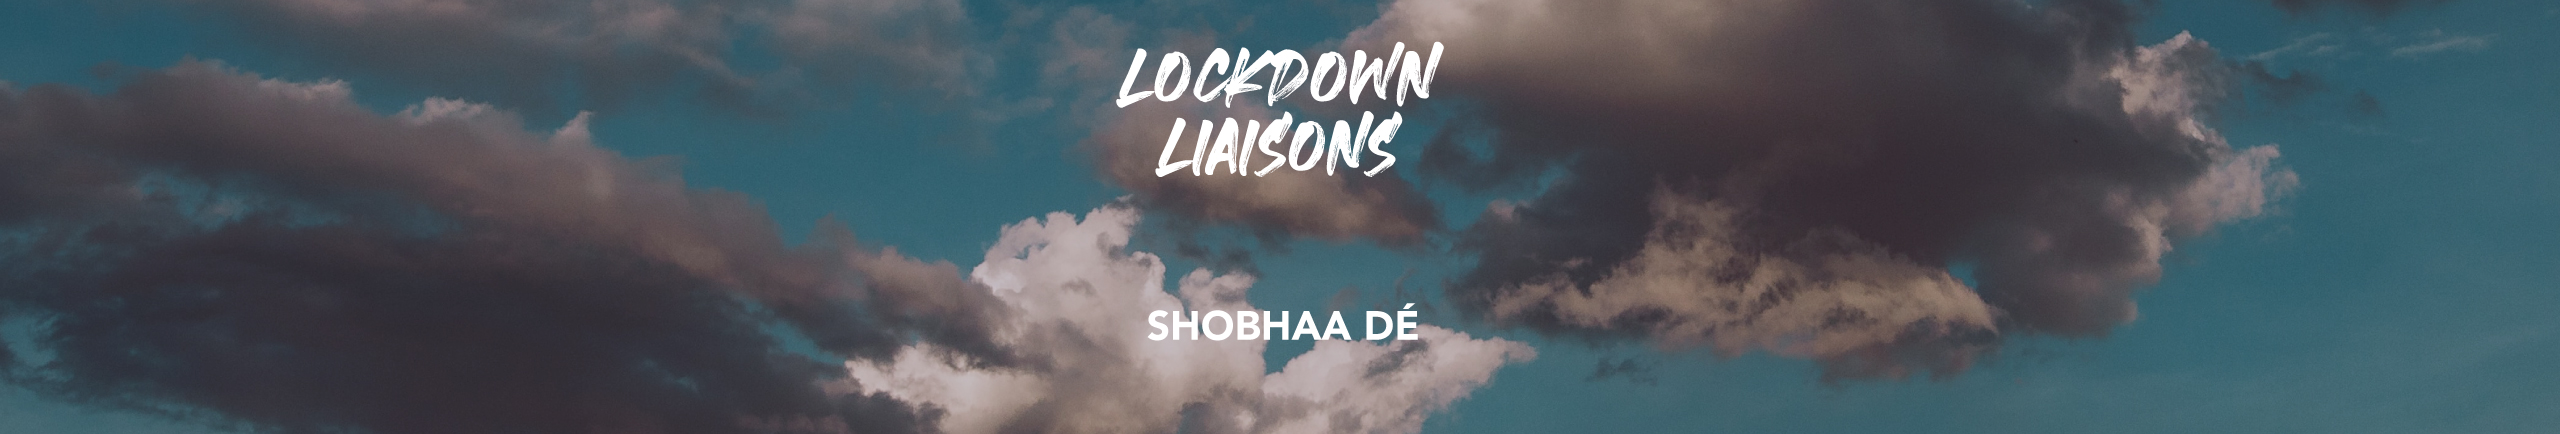 """Lockdown-Liaisons-Shobhaa-De""/"